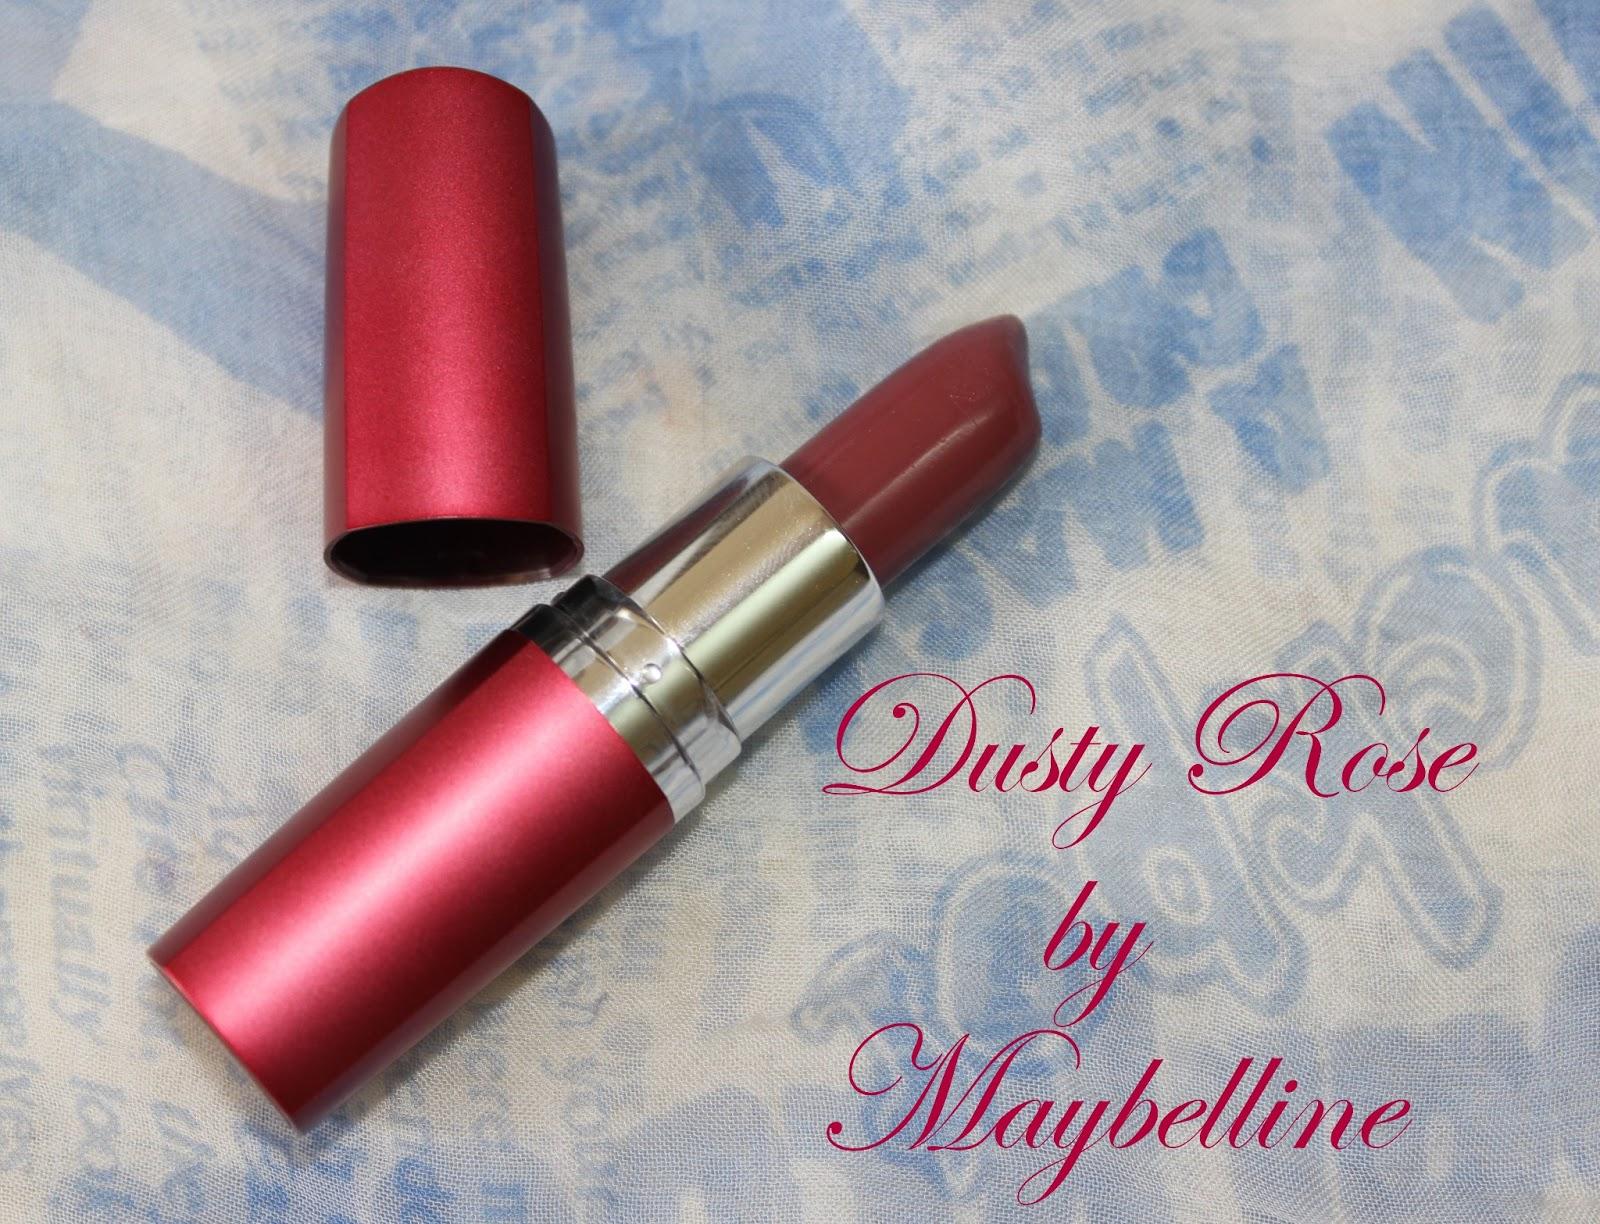 Maybelline Colorsensational Moisture Extreme Lipstick In